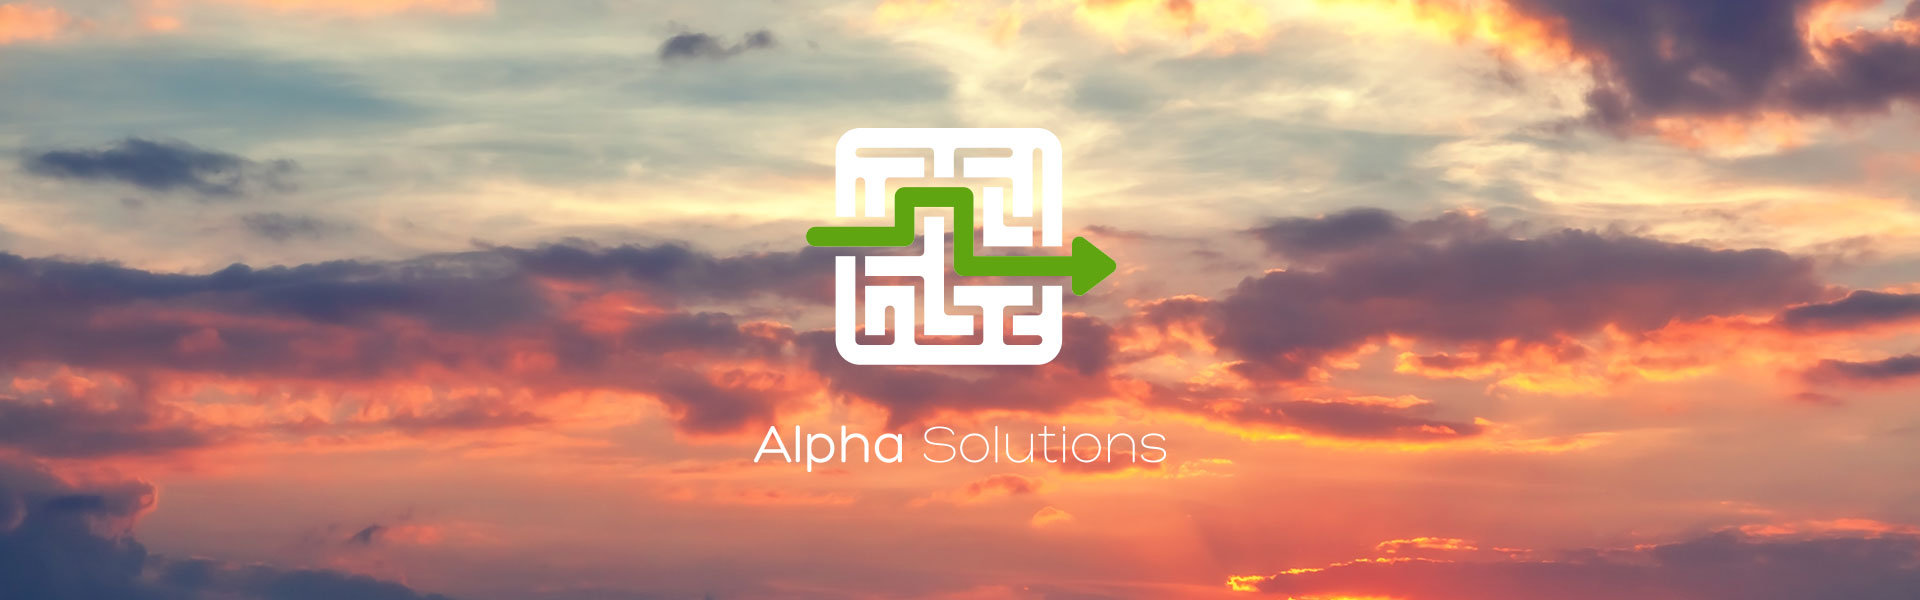 Alpha Solutions Management About Us